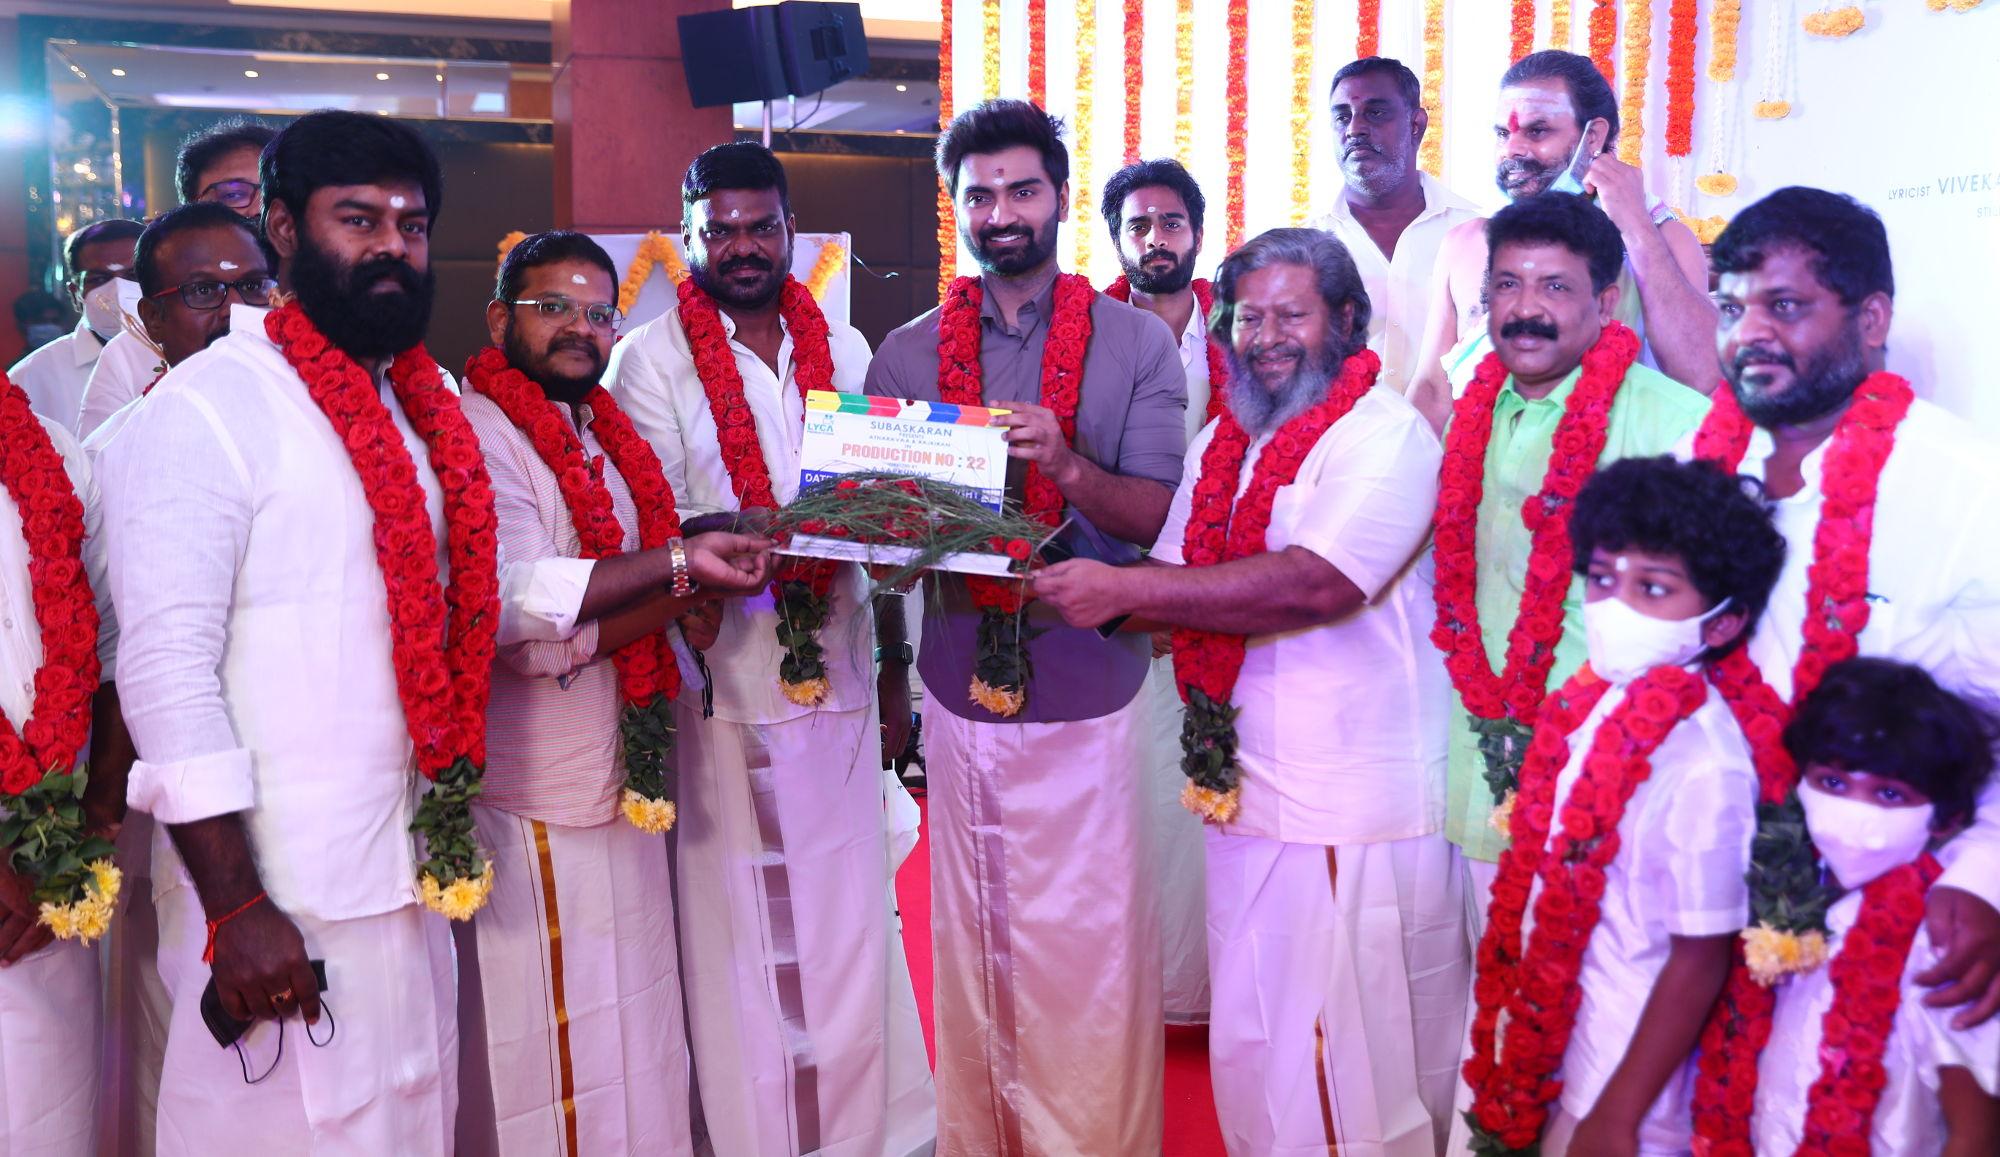 Lyca Productions Atharvaa Murali Rajkiran Sarkunam Film launched